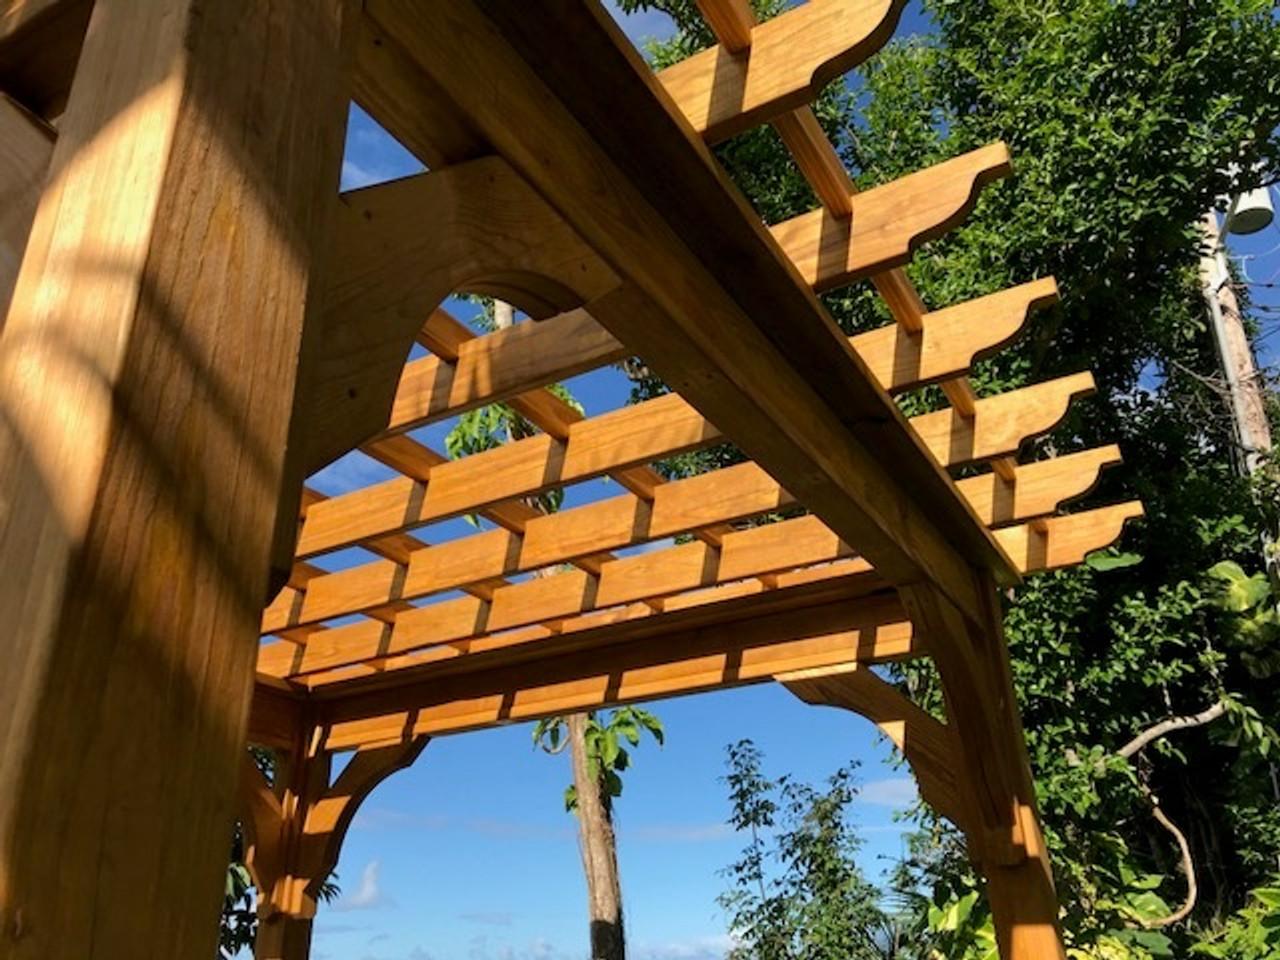 10x10 Pressure Treated Pine Serenity Pergola Kit Corner Braces, U.S. Virgin Islands